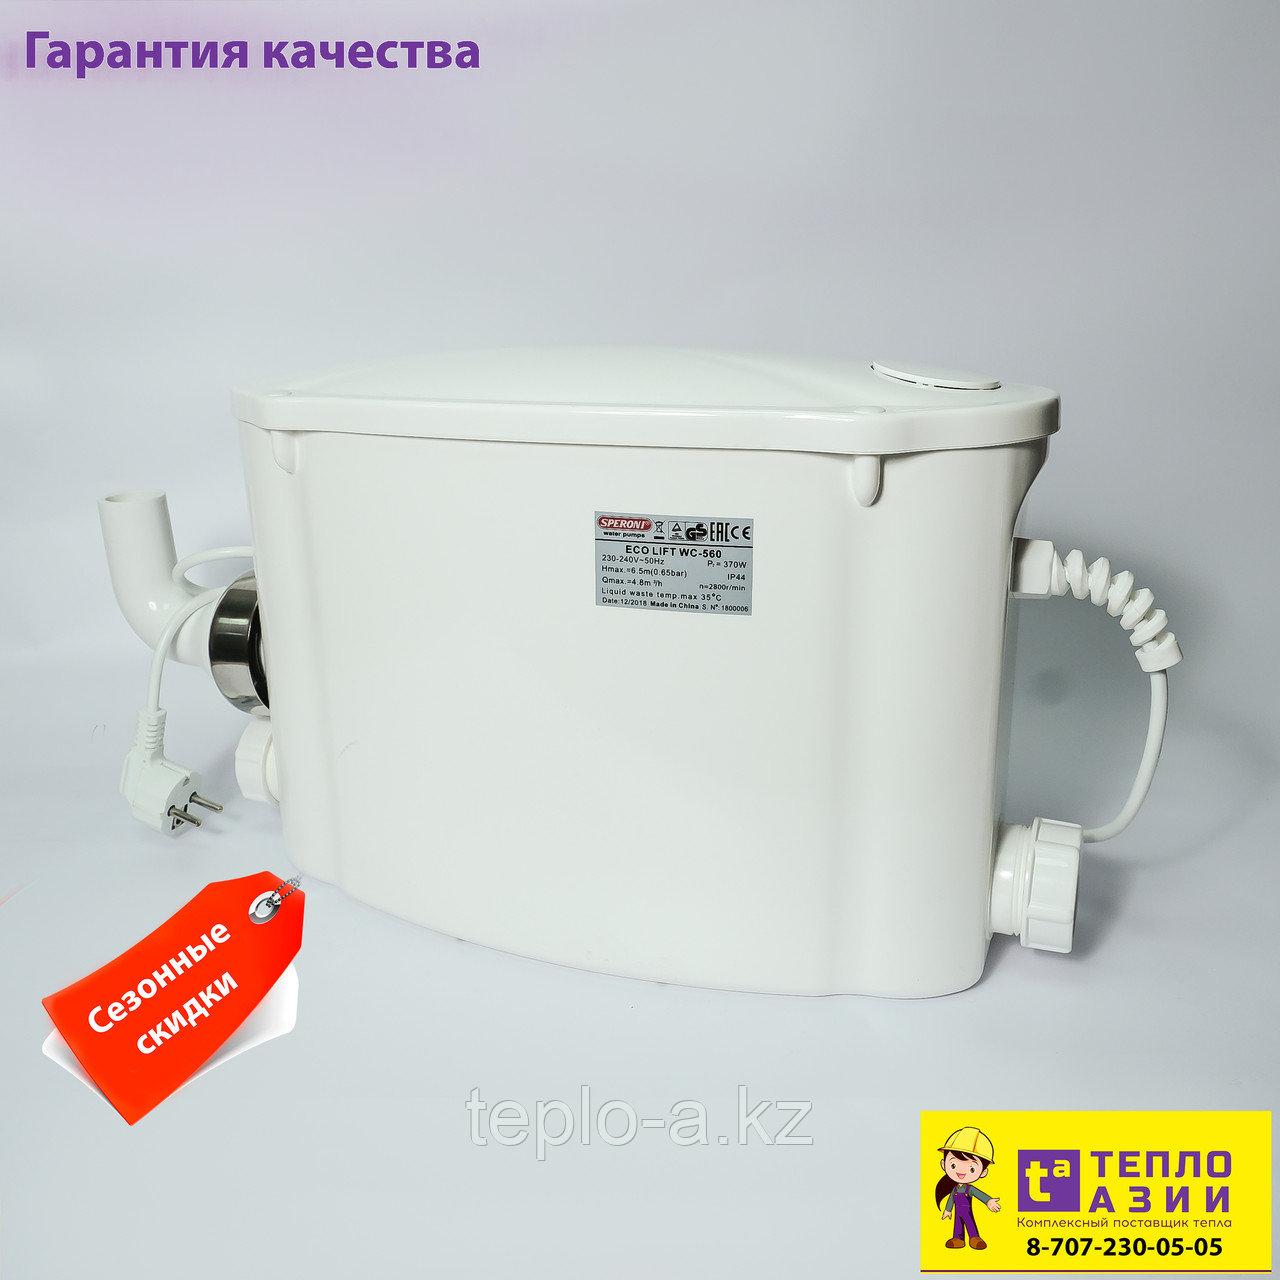 Насос канализационный Speroni ECO LIFT WC 560